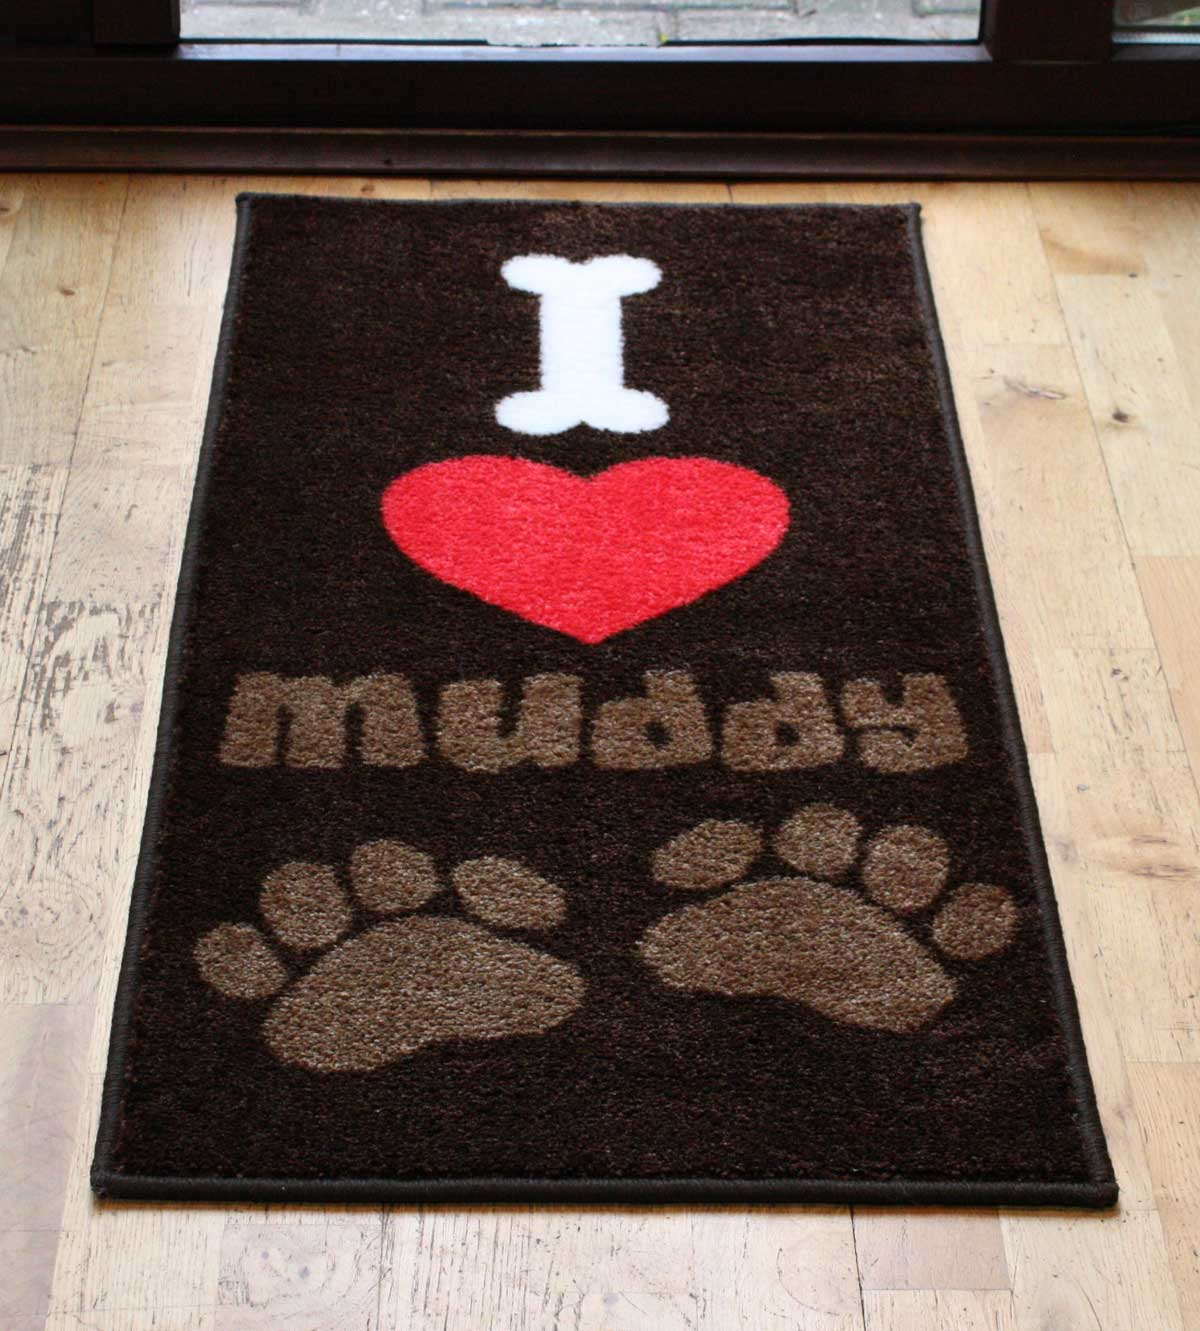 floors indoor amazon floor rectangle pattern dp purple decor x runner com home fleece kitchen carpet doormat coral mat thin puppy dog yjbear